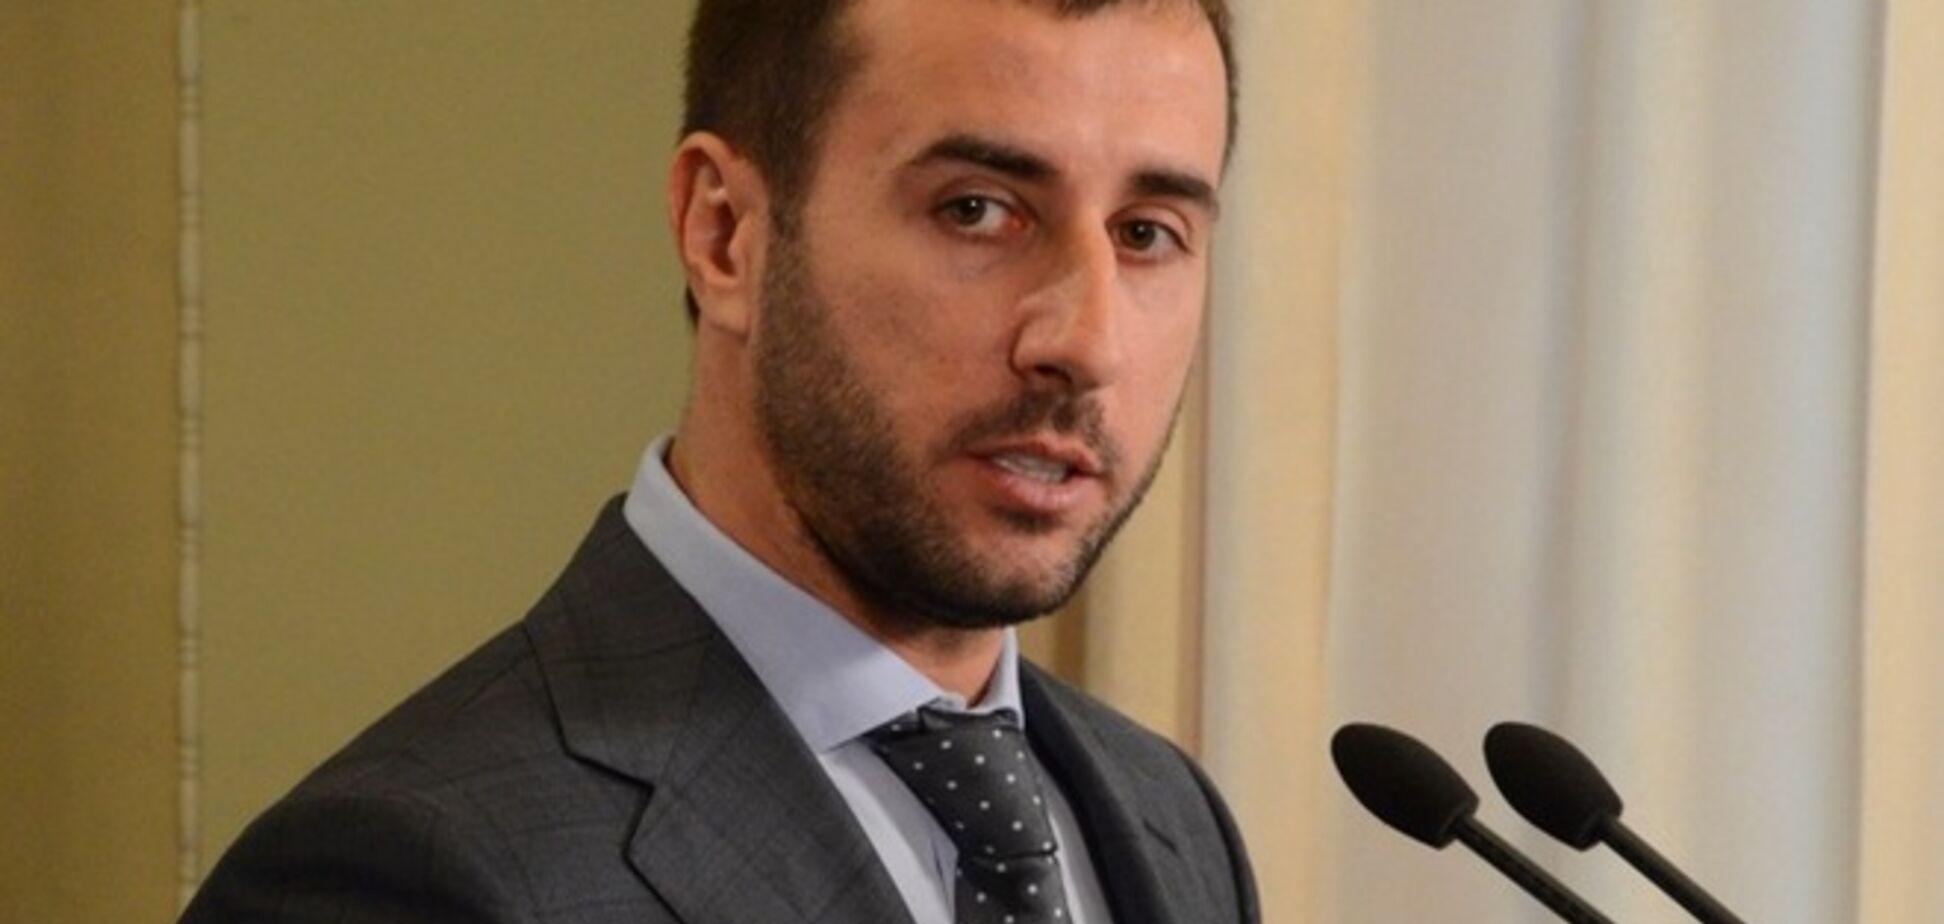 Сергей Рыбалка: меня сняли с поста главы комитета за критику НБУ и Минфина